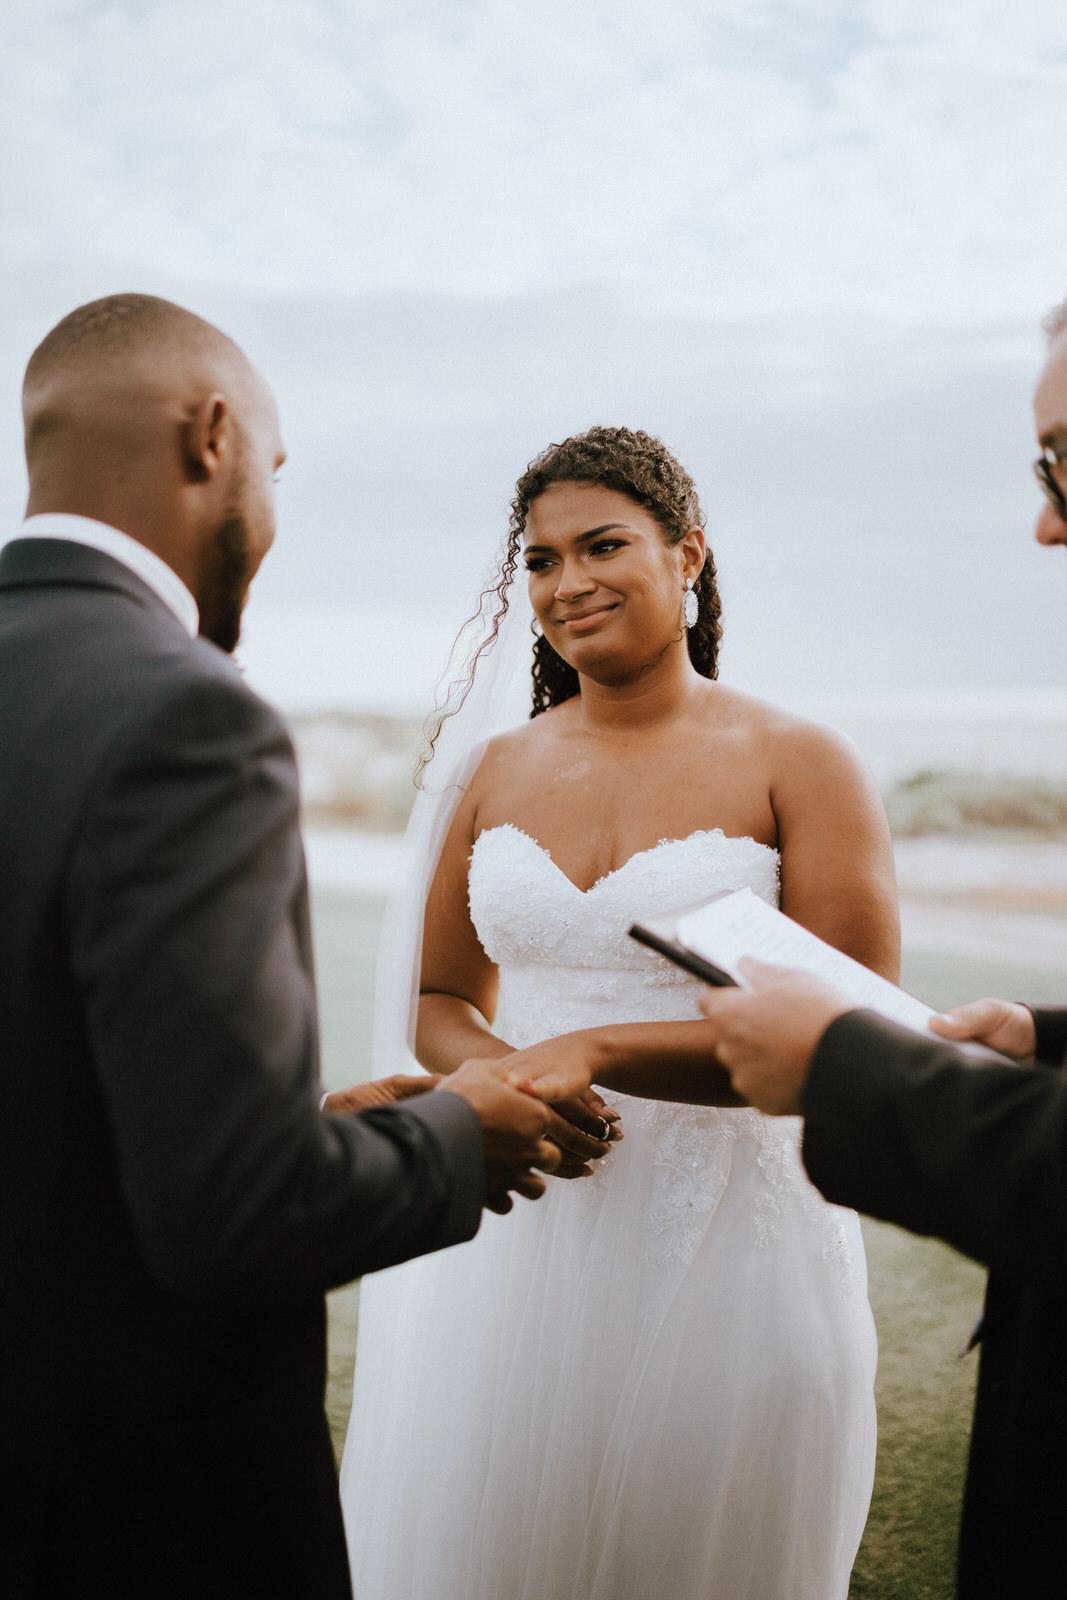 South Seas Island Resort Elopement- Alyana and Shawn- Michelle Gonzalez Photography-480.JPG